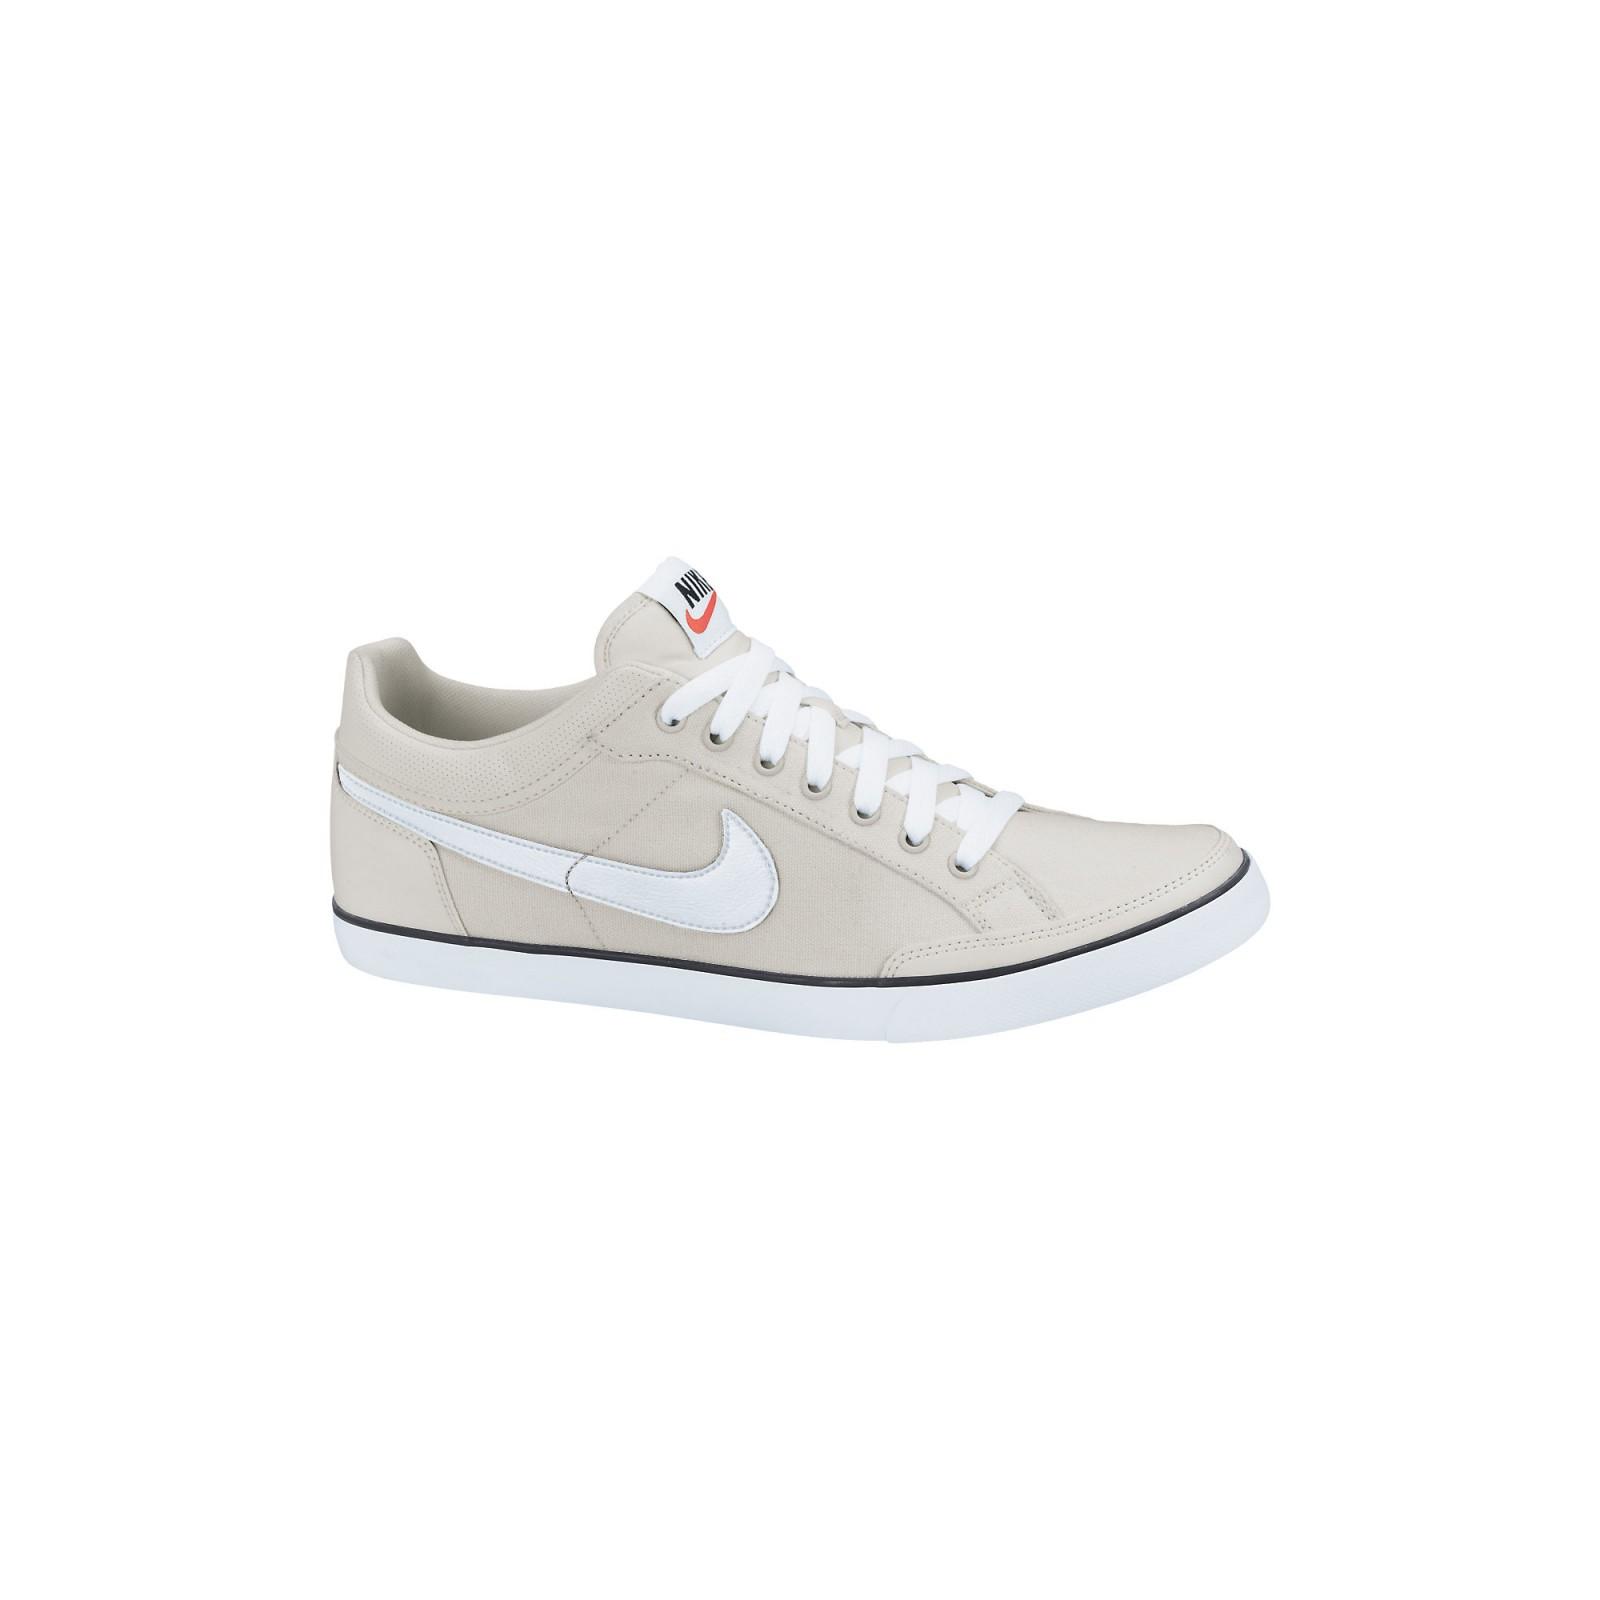 Nike Capri III Low TXT shoes beige white